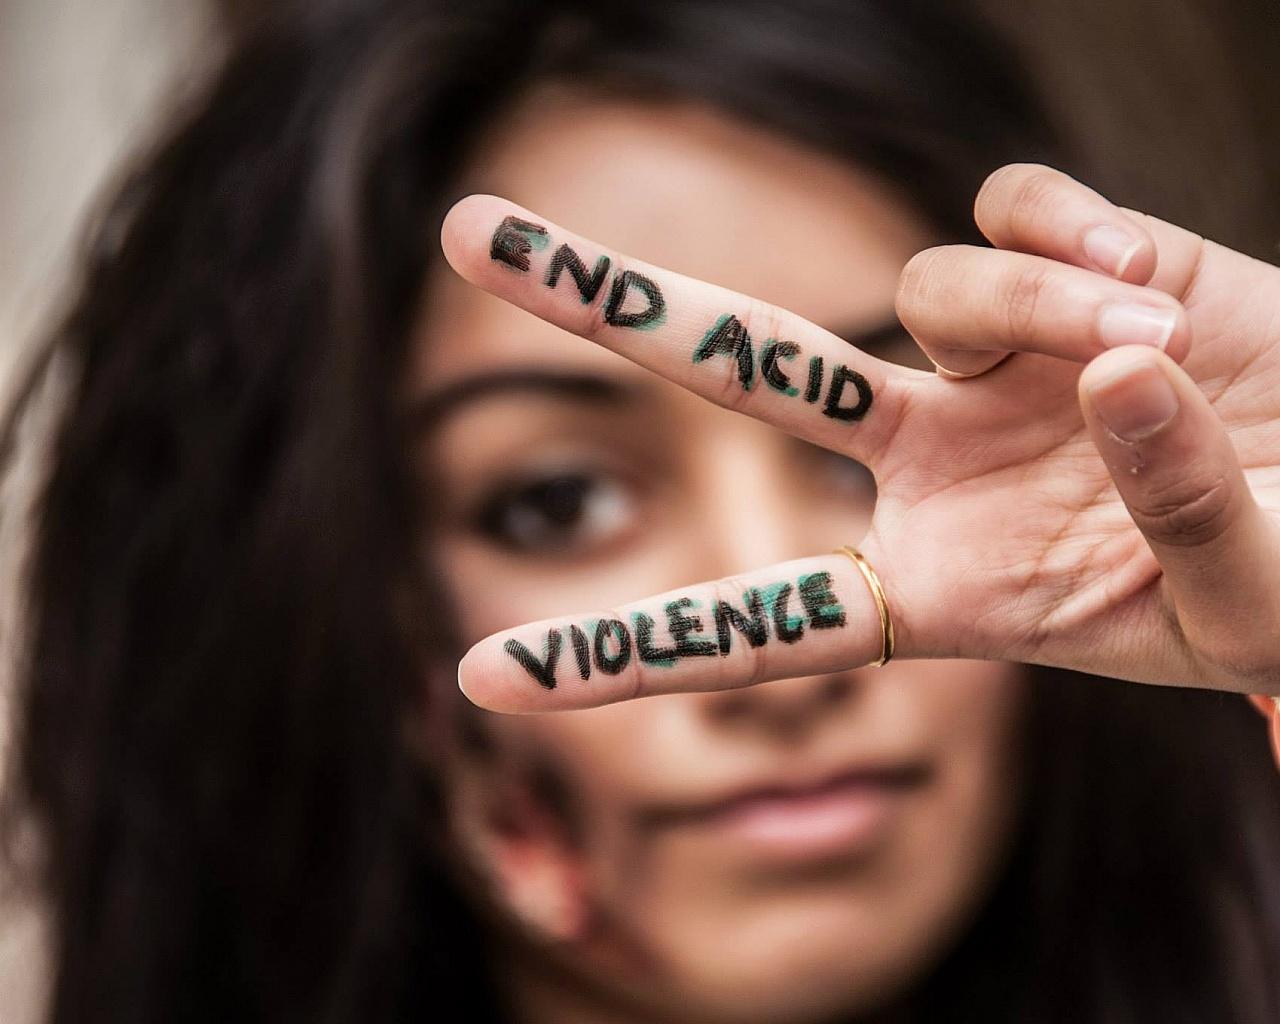 acid violence